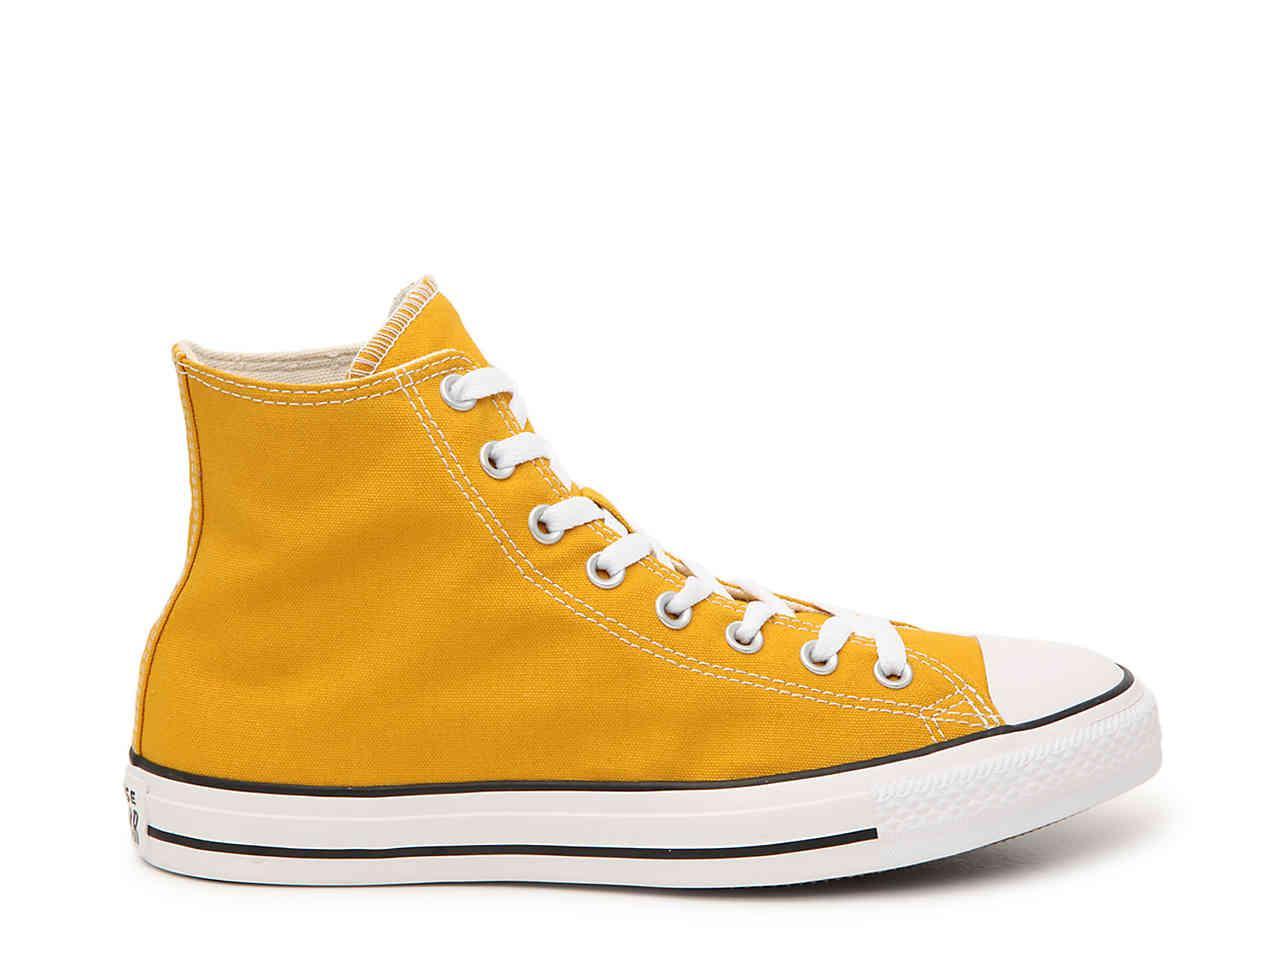 mustard yellow chuck taylor